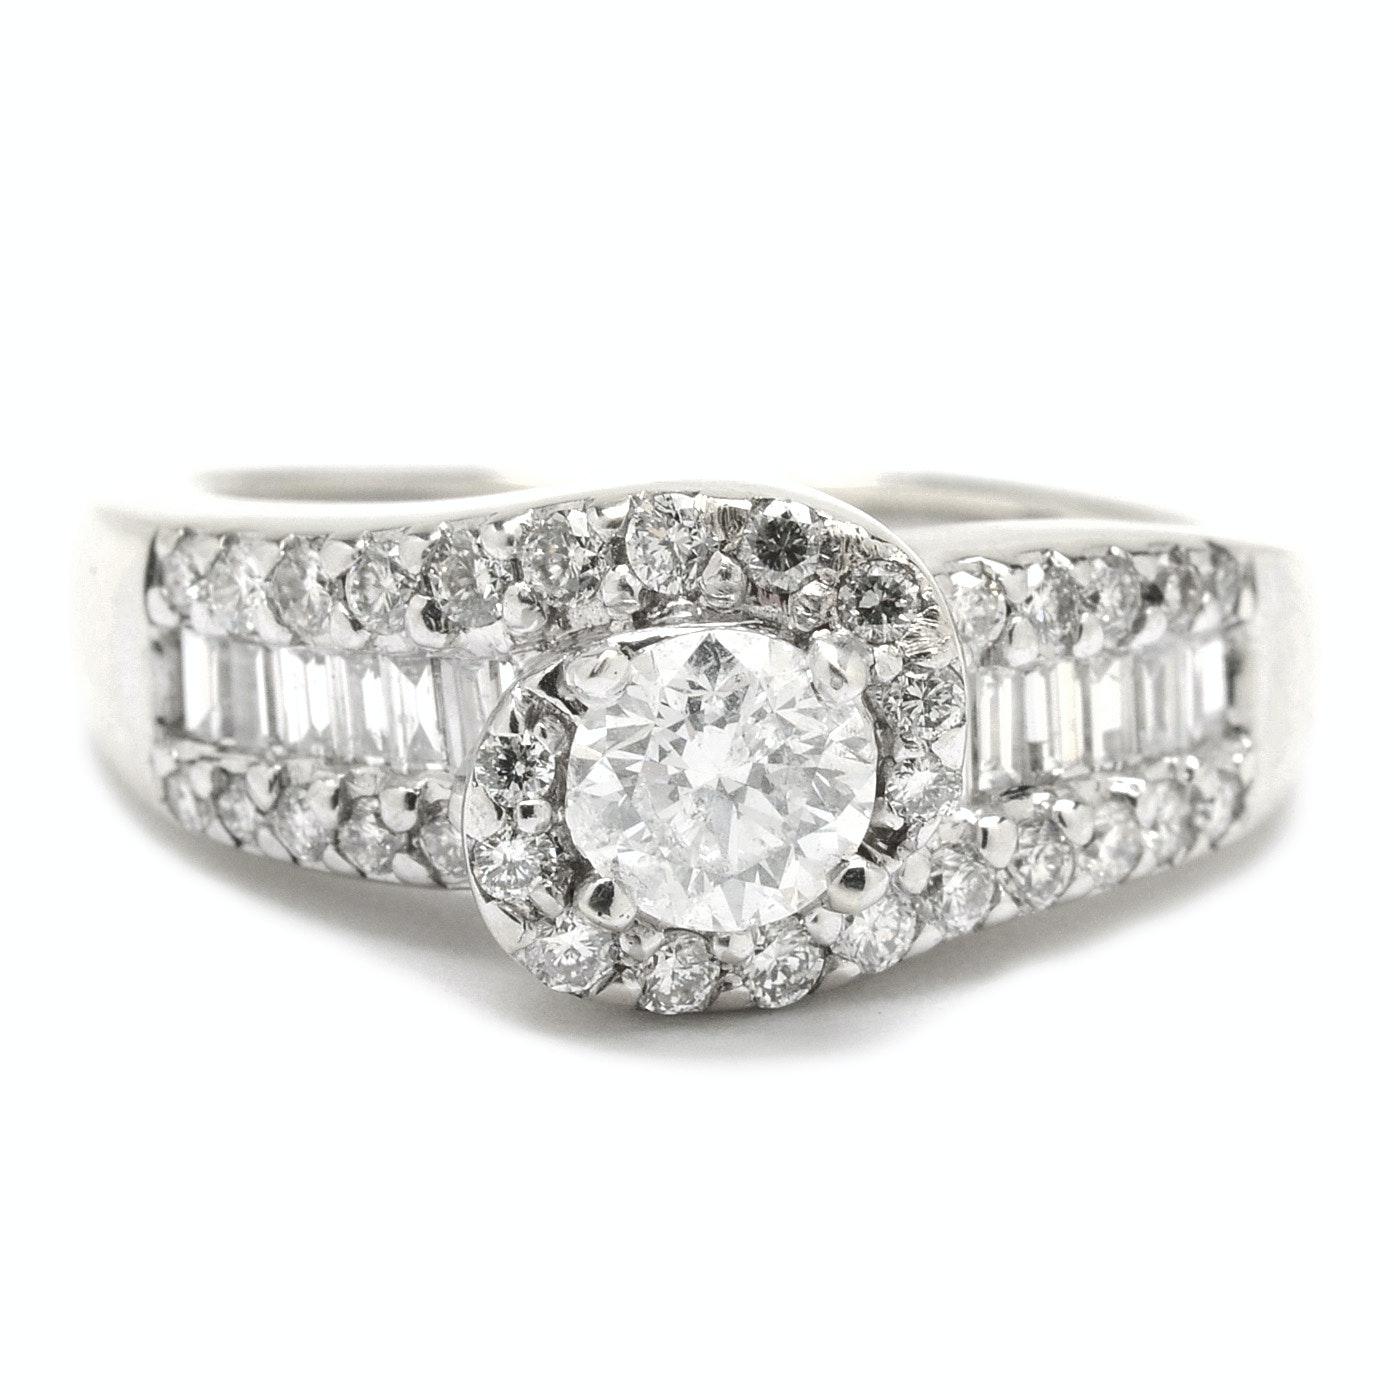 10K Yellow Gold Diamond Statement Ring